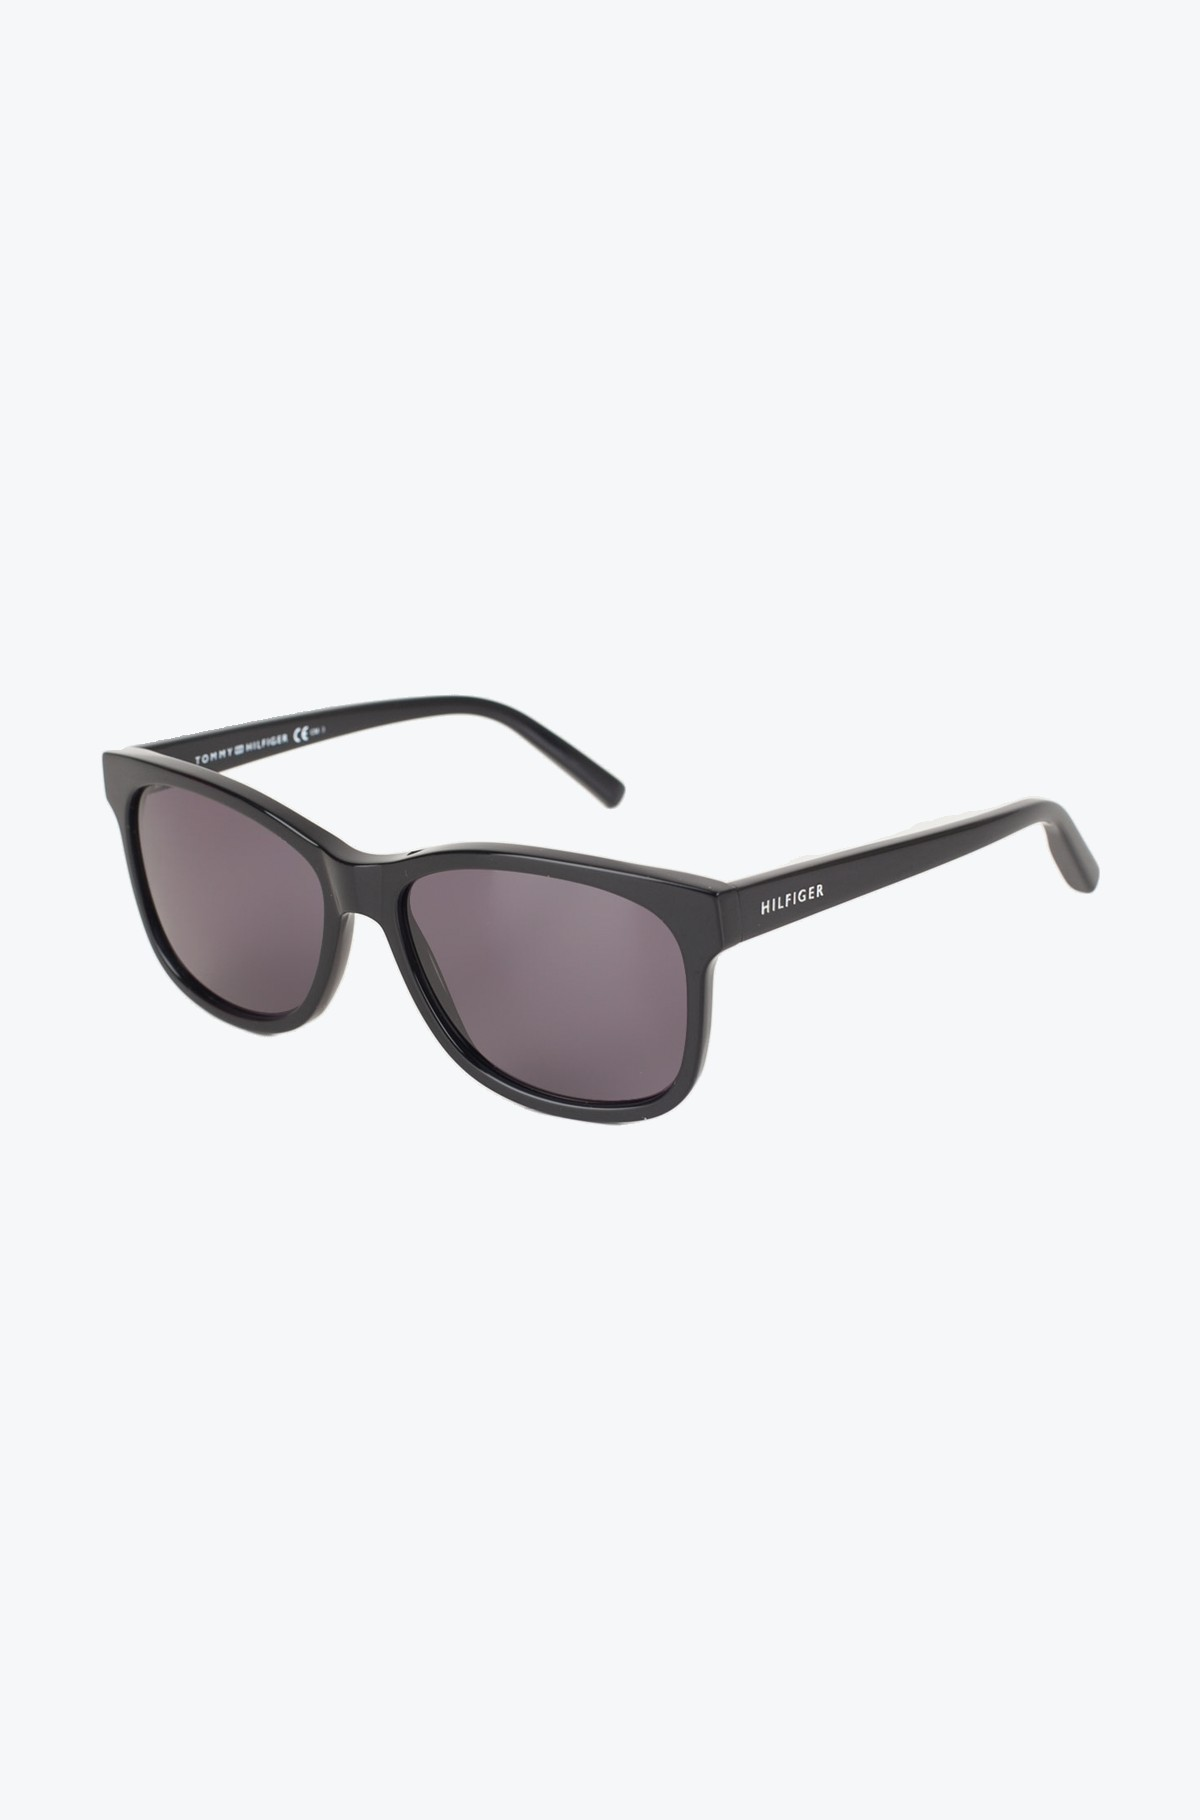 Sunglasses 1985-full-1